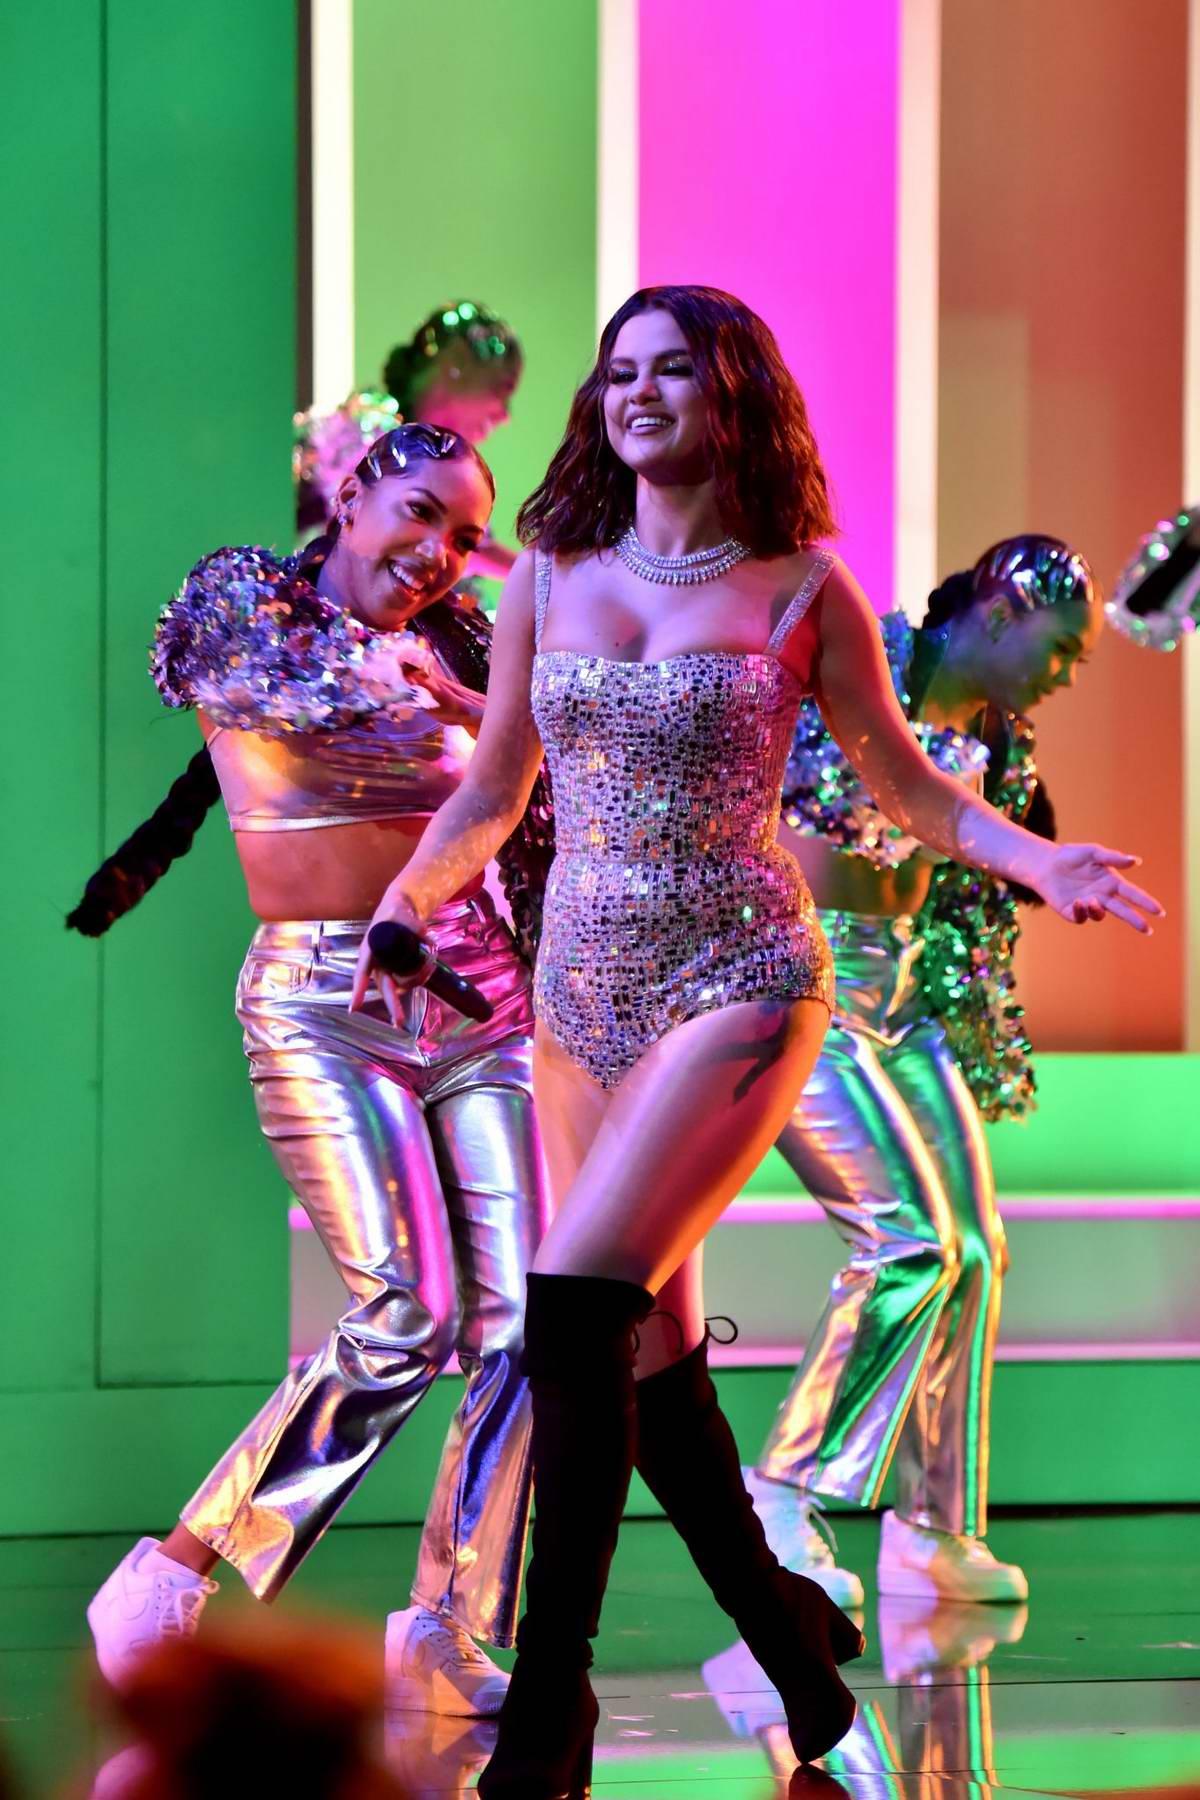 Selena Gomez Performs At The American Music Awards At